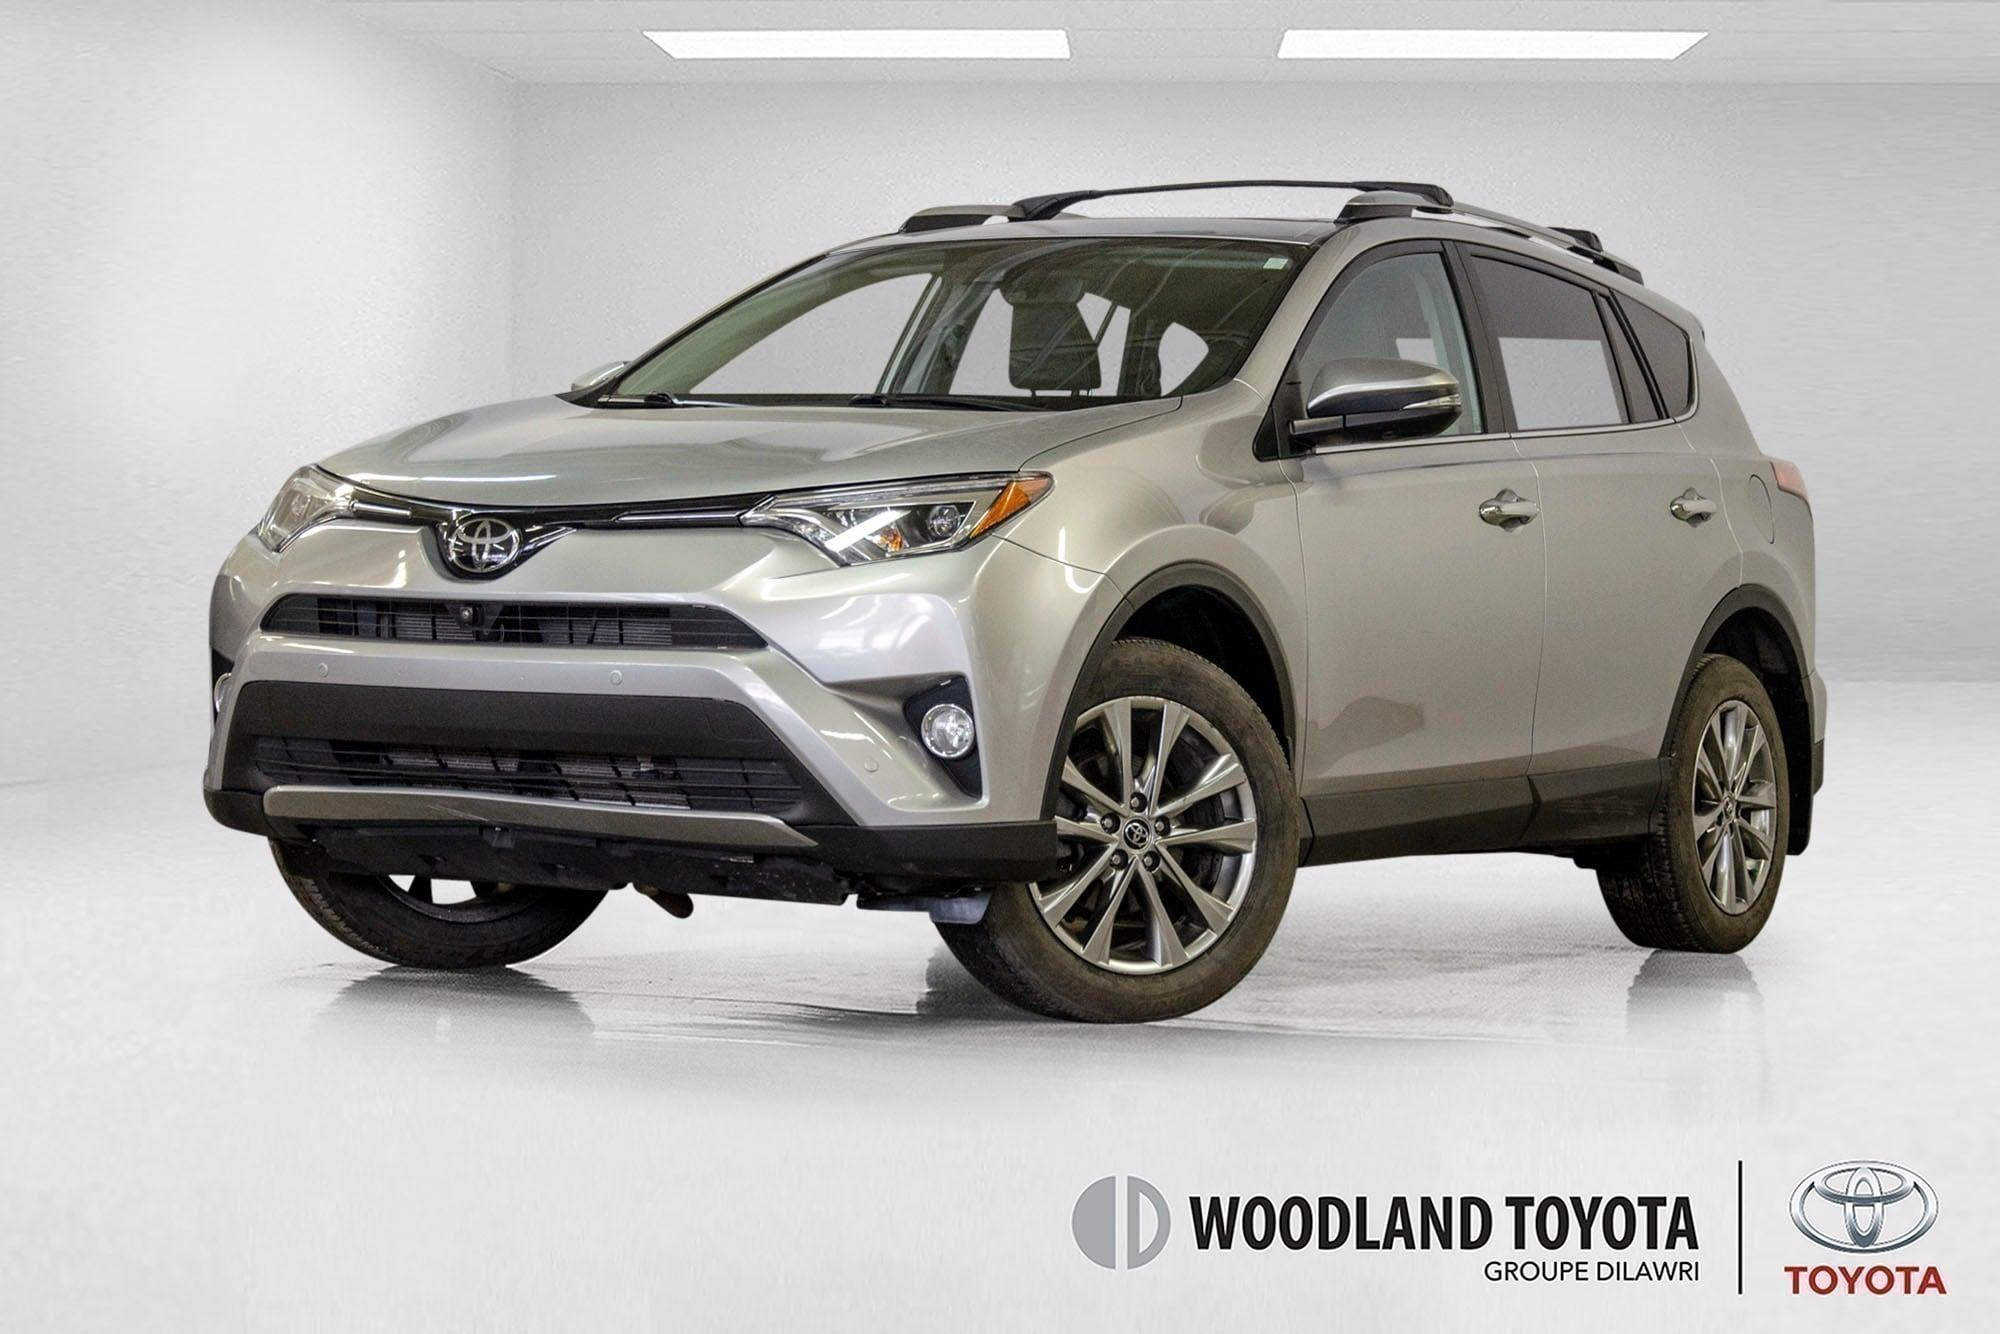 2017 Toyota Rav4 Limited / Awd / Cuir / Toit / Bluetooth ++ SUV